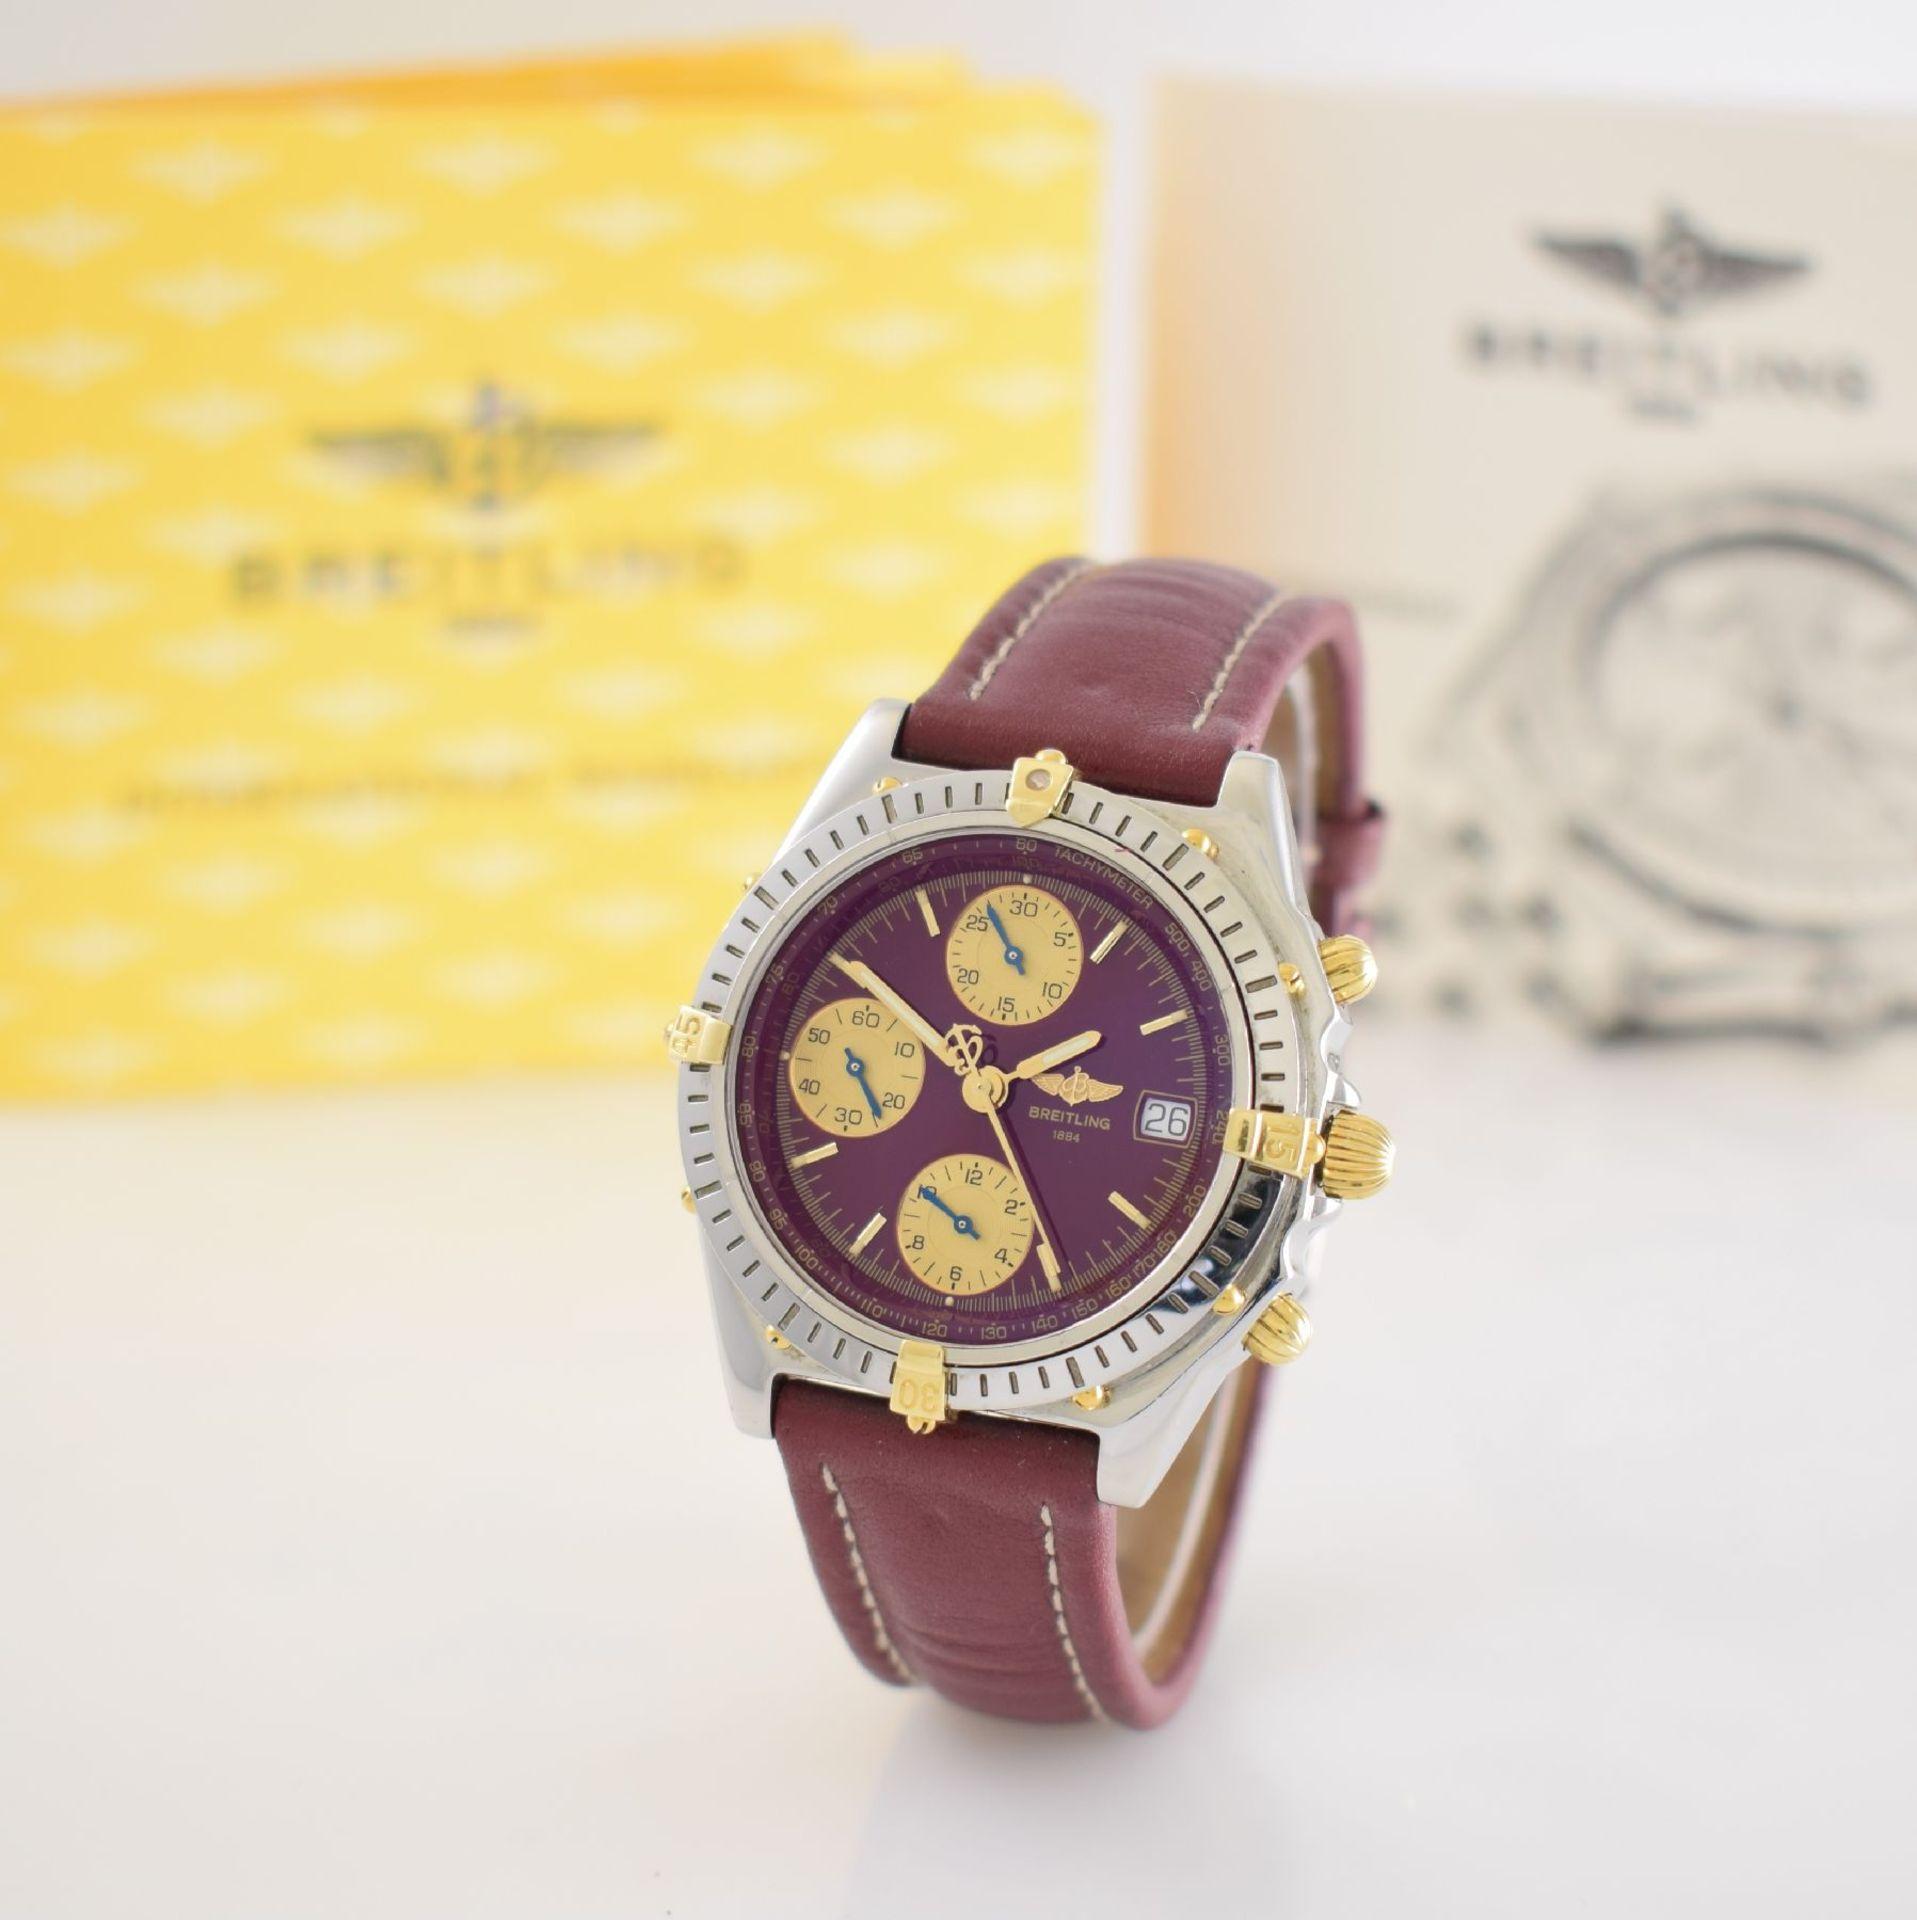 BREITLING Chronomat Herrenarmbanduhr mit Chronograph, Schweiz verk. lt. beil orig. Garantiekarte - Bild 4 aus 8